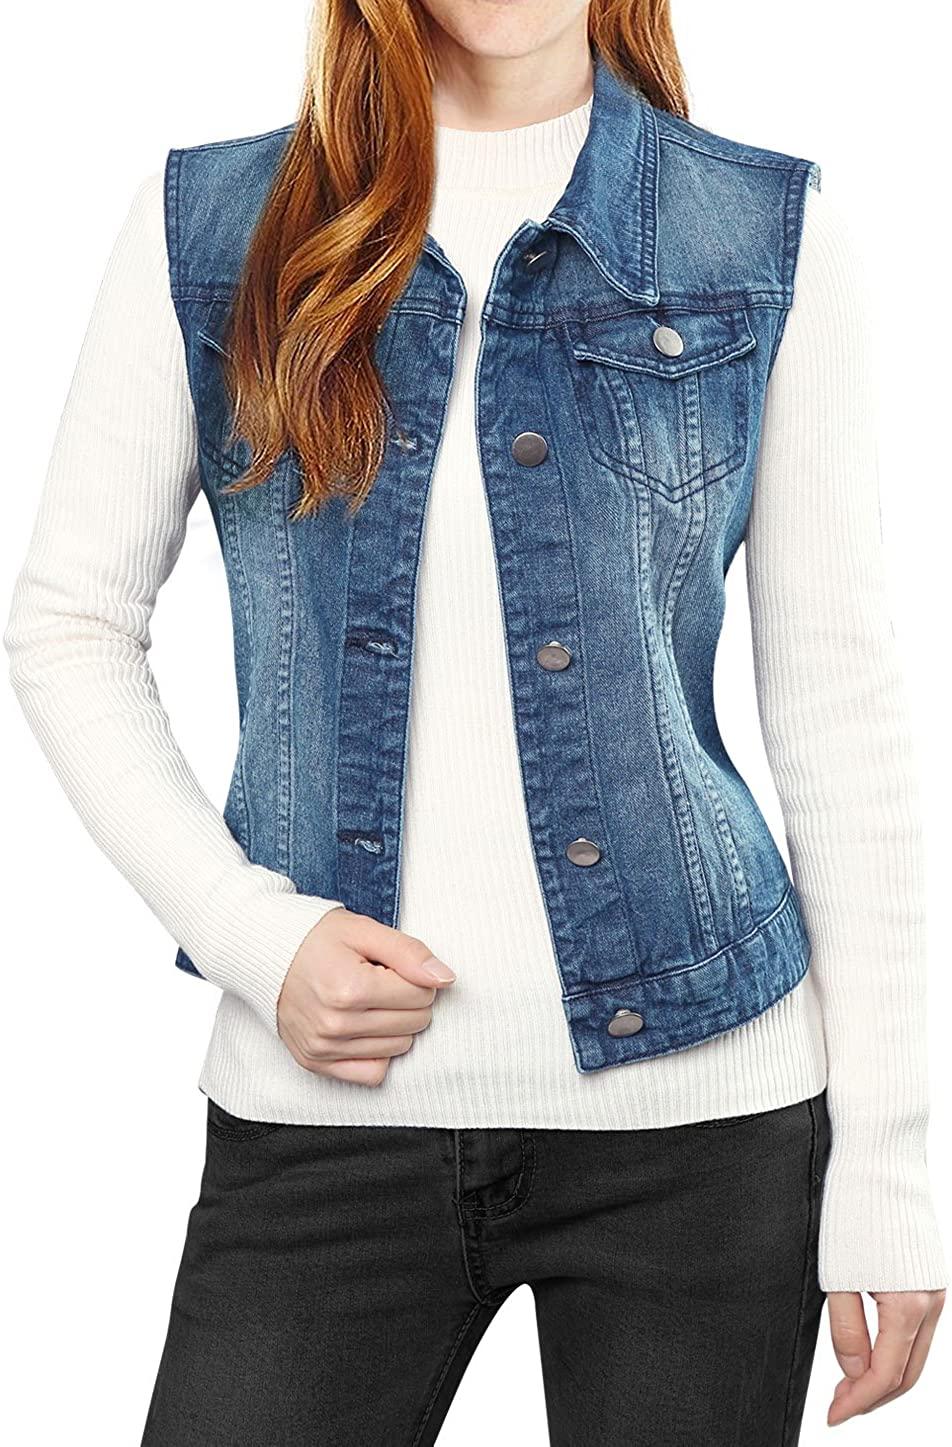 Allegra K Women's Buttoned Washed Denim Vest Jacket W Chest Flap Pockets